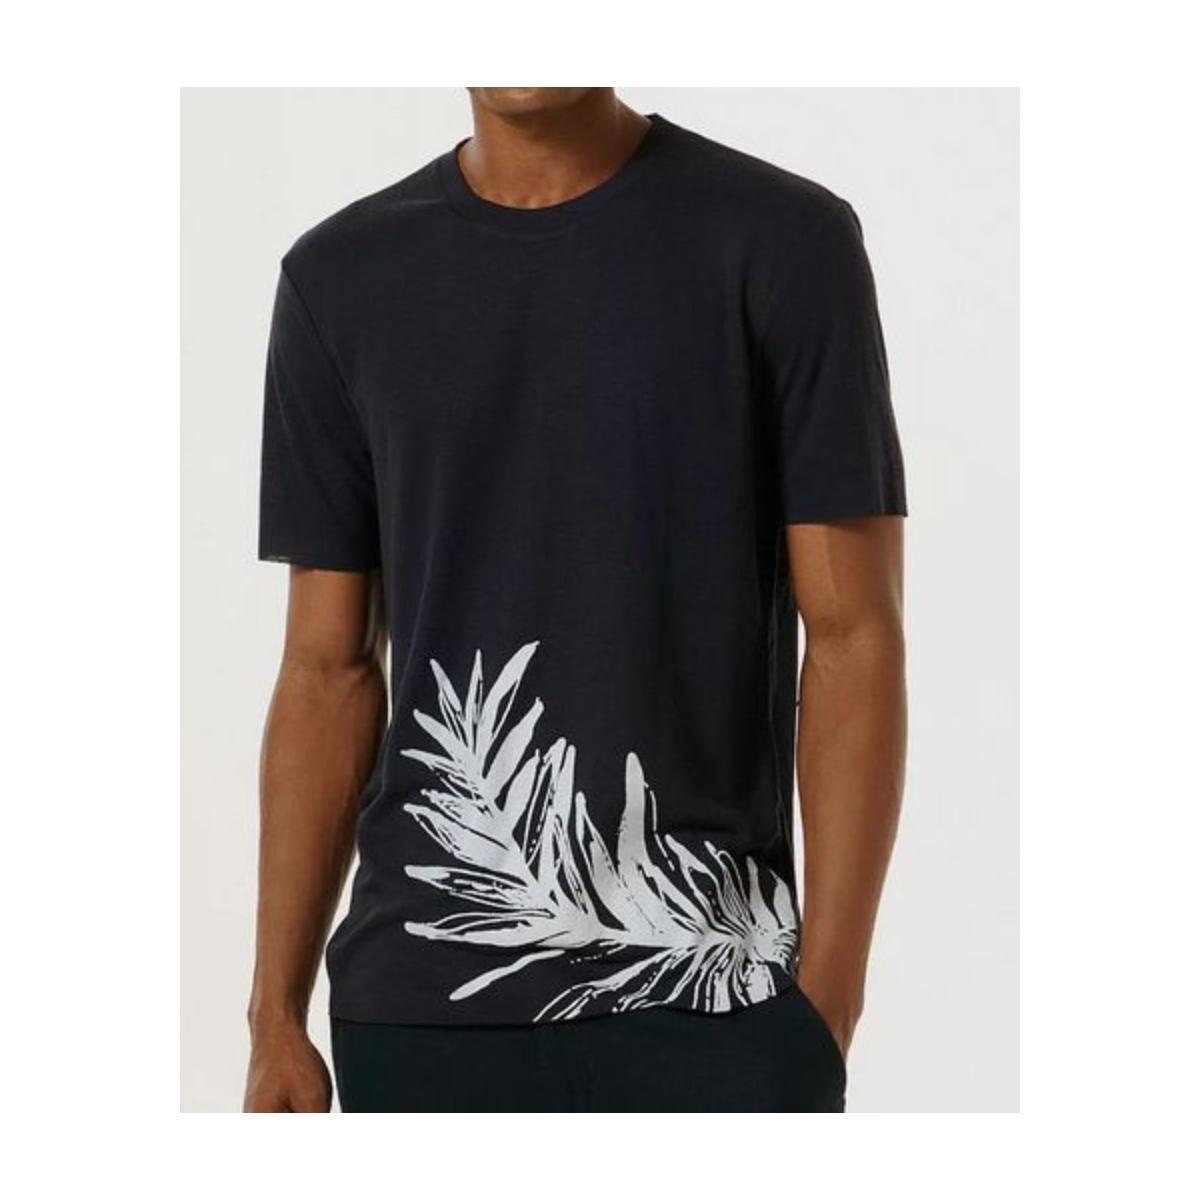 Camiseta Masculina Hering 4f7a Ax7en Azul